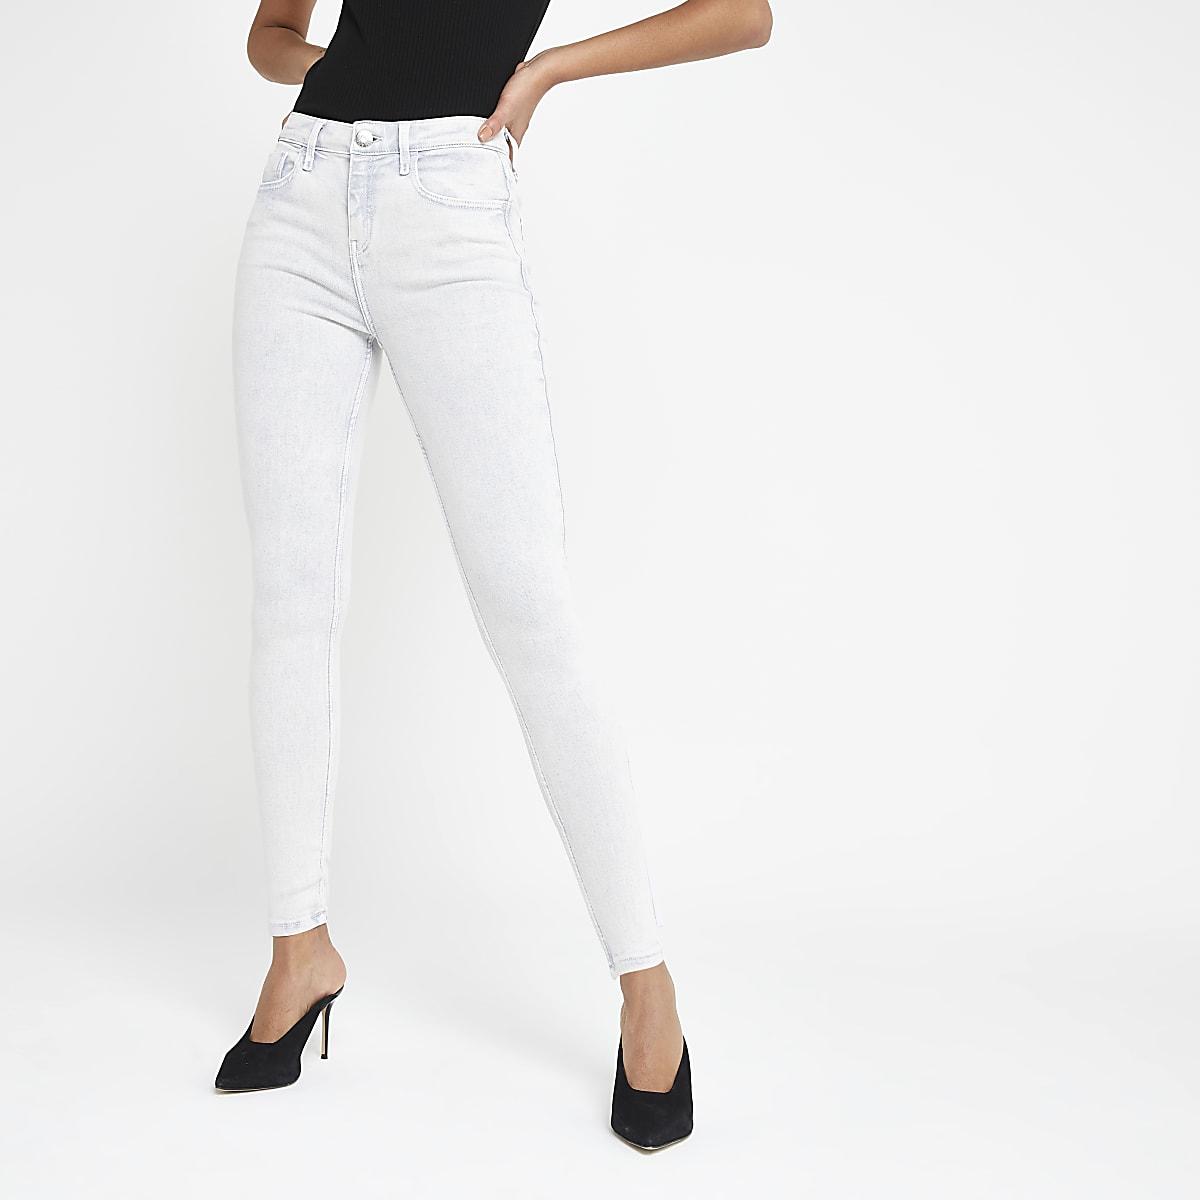 Amelie lichtgrijze superskinny jeans